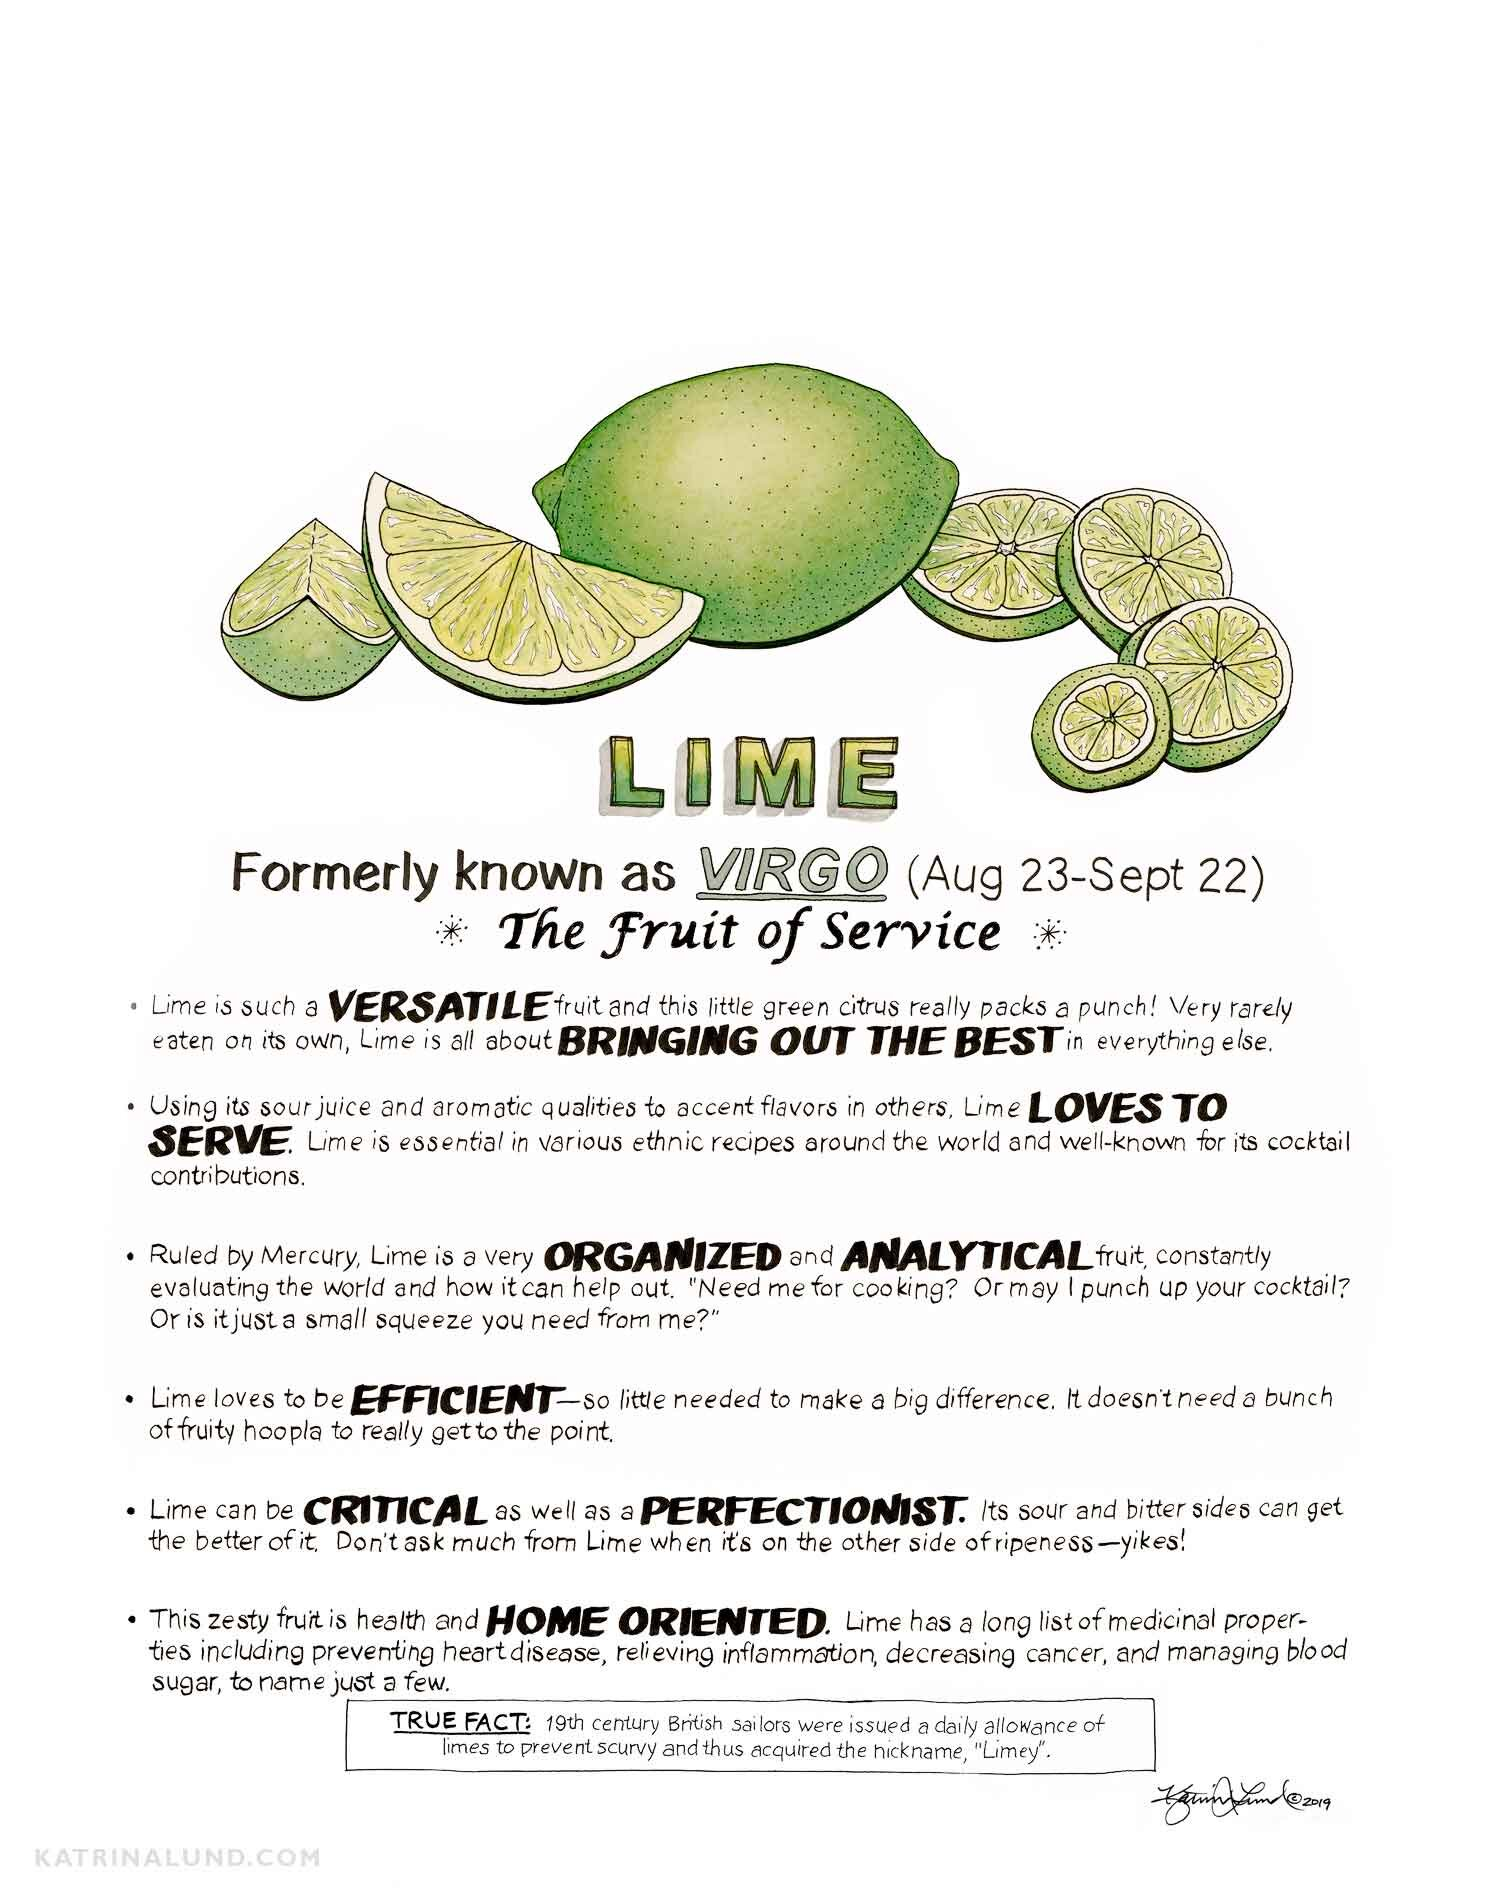 KatrinaLundArt_FruitAstrology_Lime_web.jpg